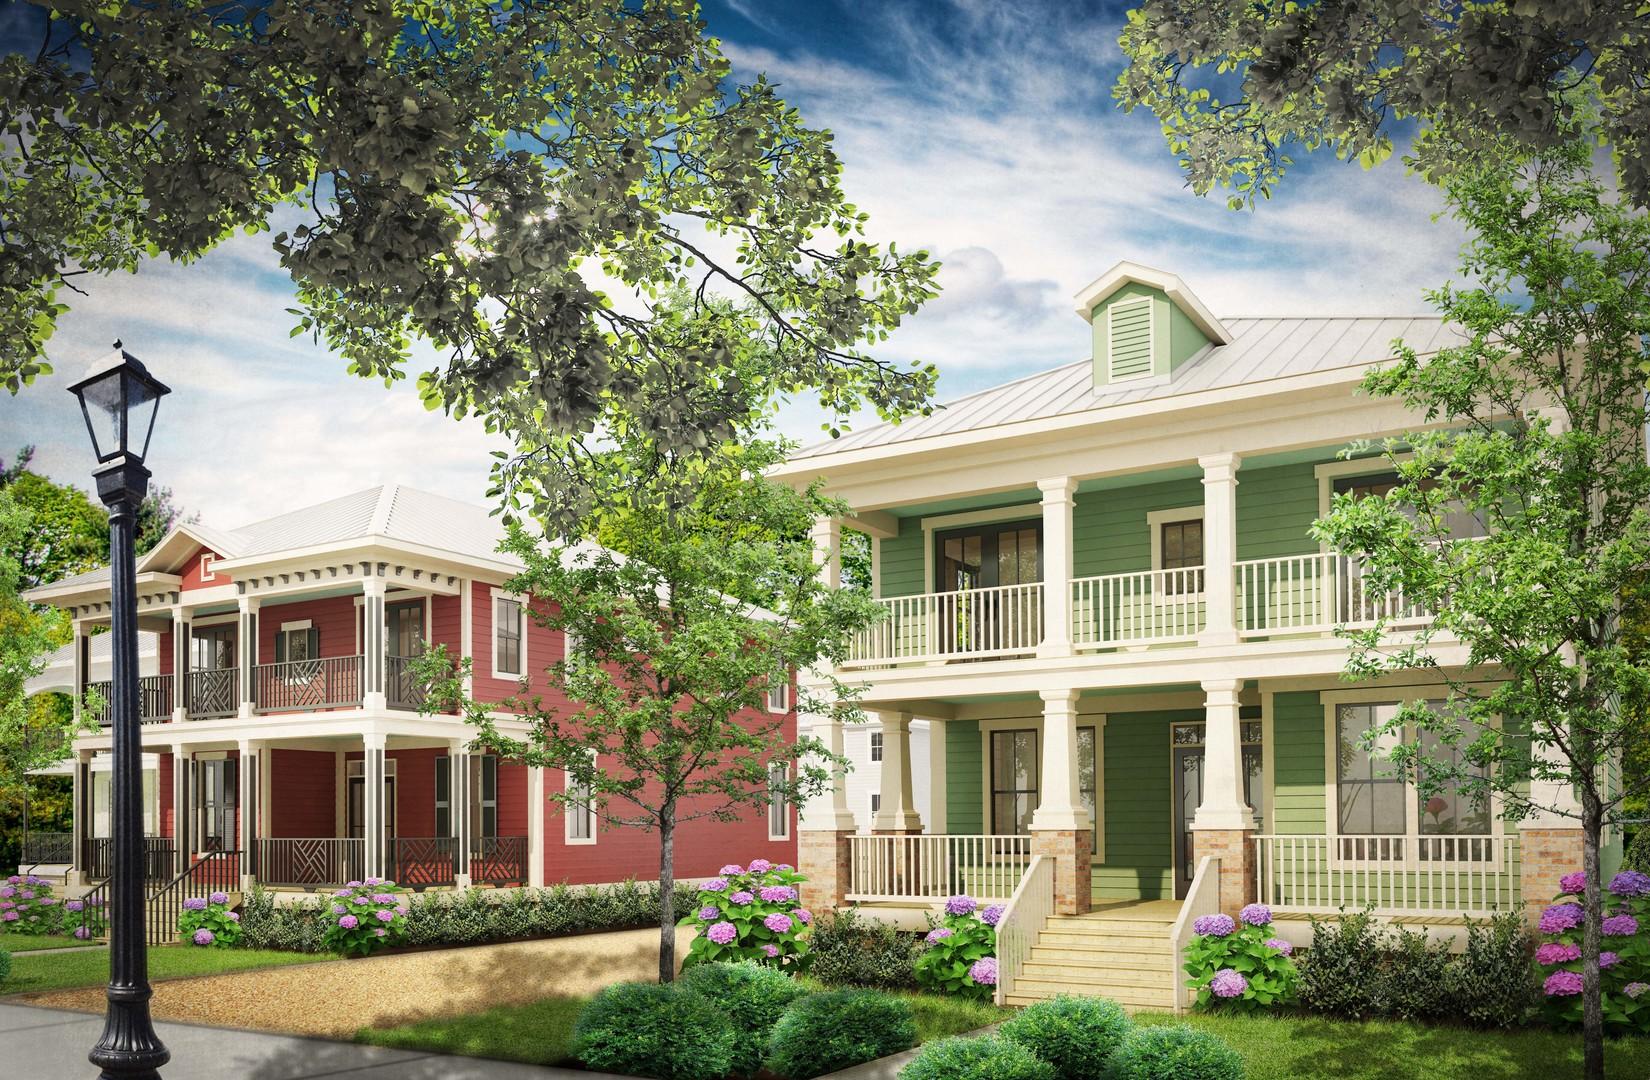 Astounding Homes For Rent Auburn Alabama 360 Management Download Free Architecture Designs Rallybritishbridgeorg